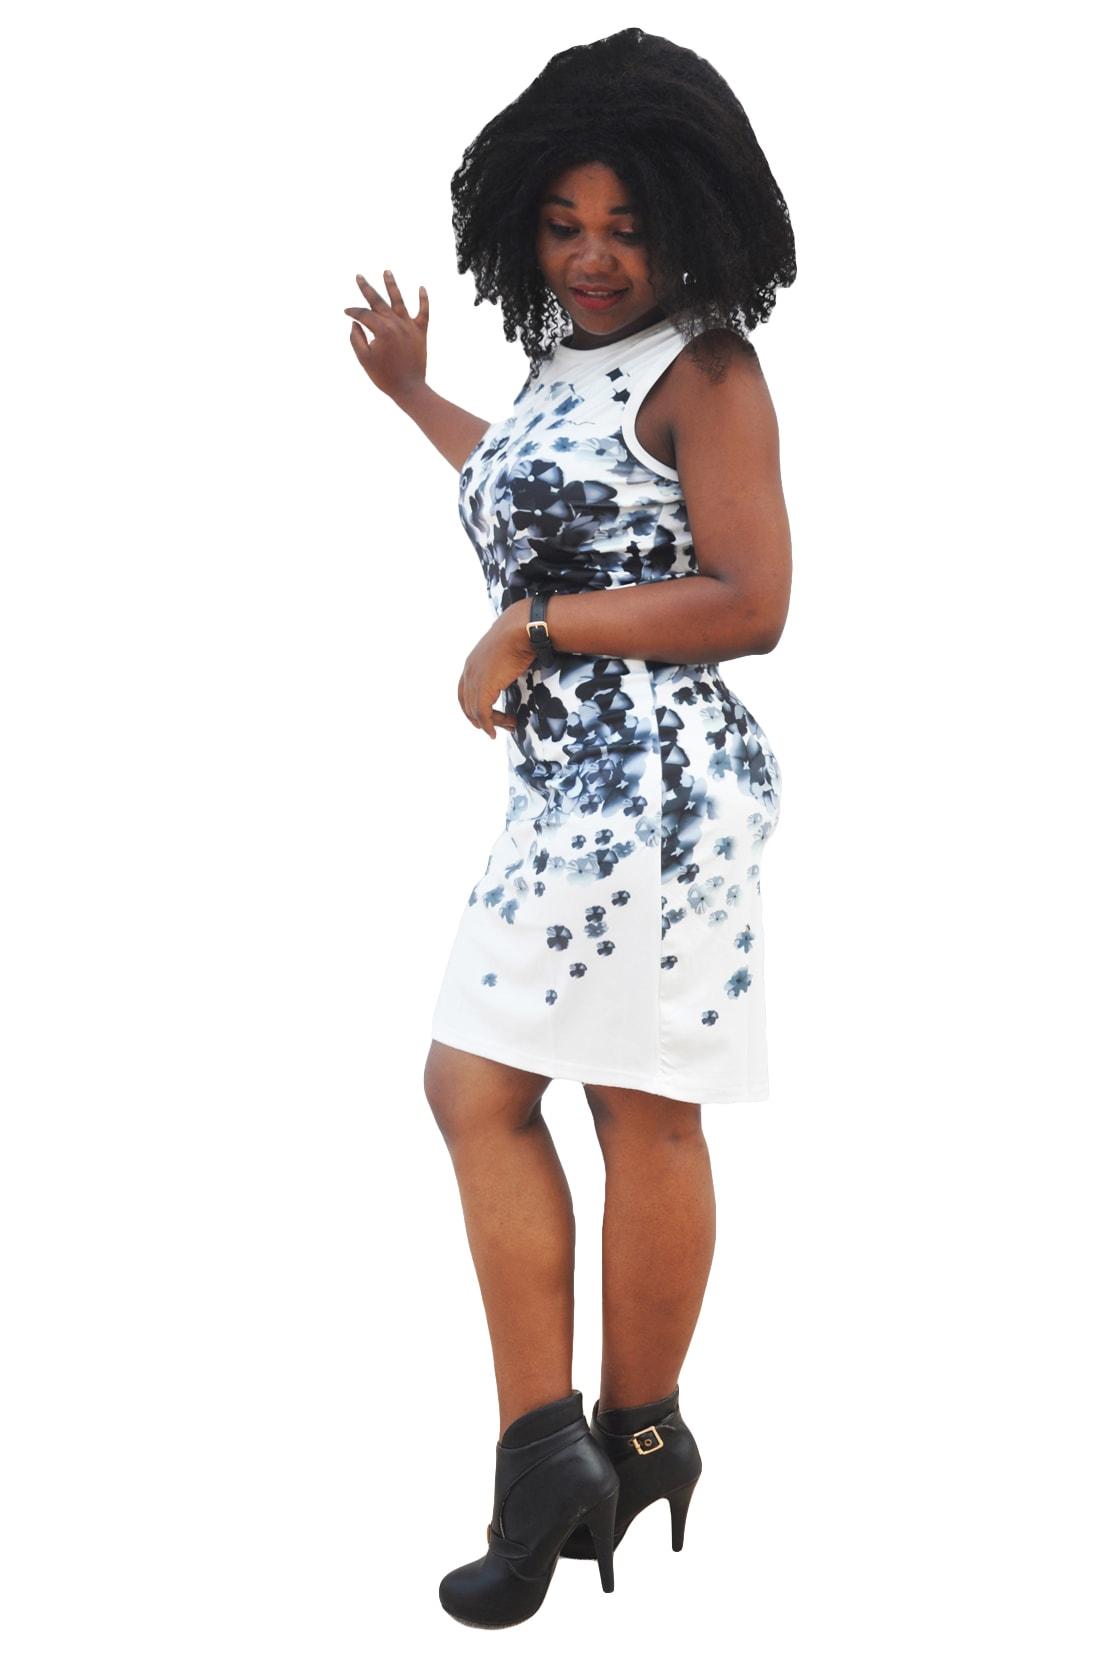 M0286 blackwhite2 Party Dresses maureens.com boutique